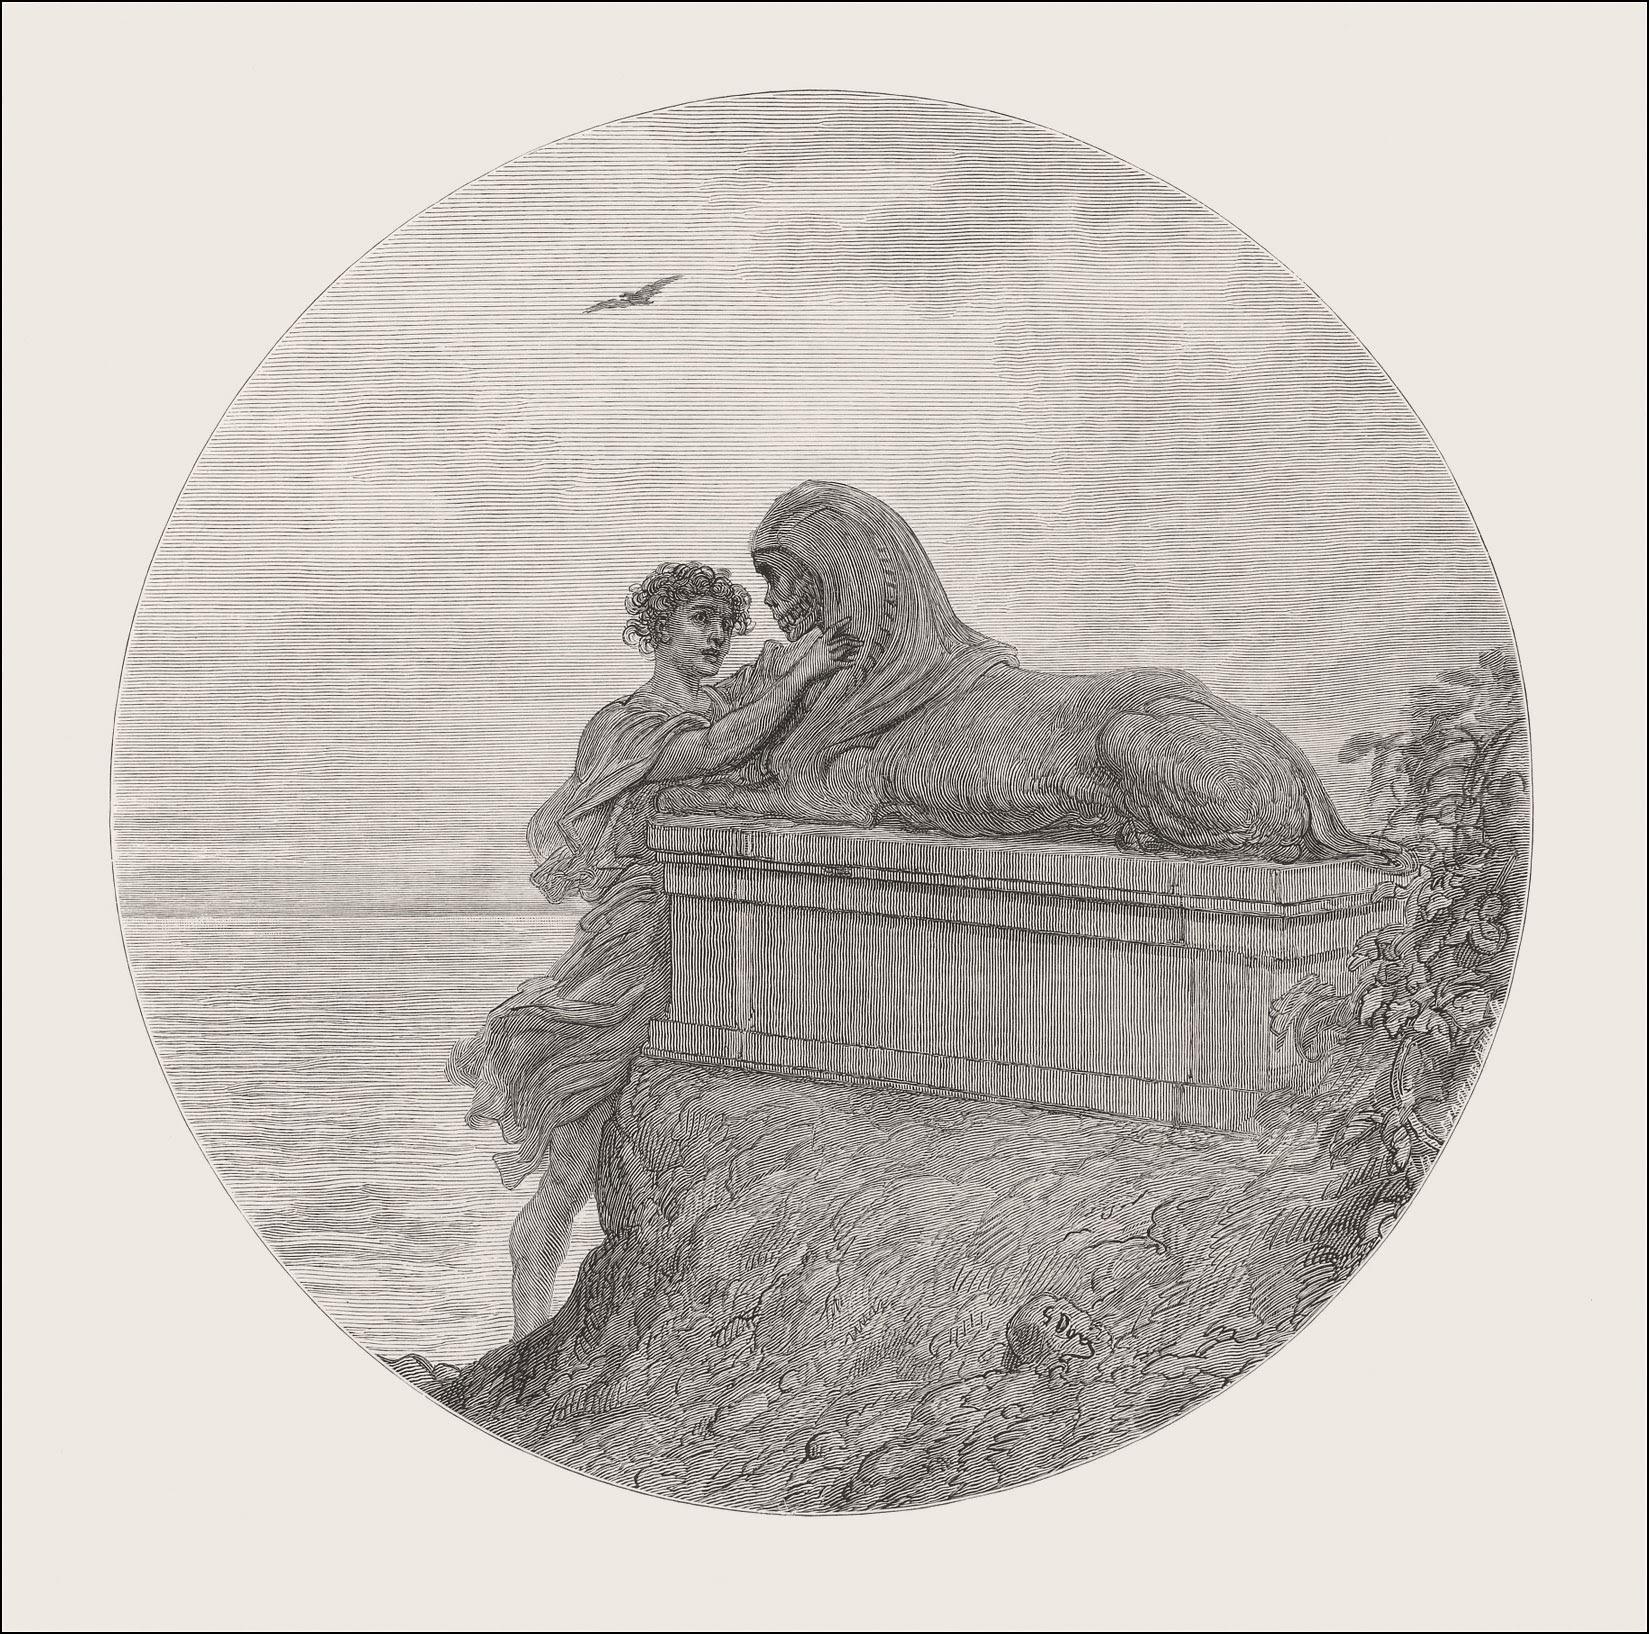 Gustave Doré, The Raven